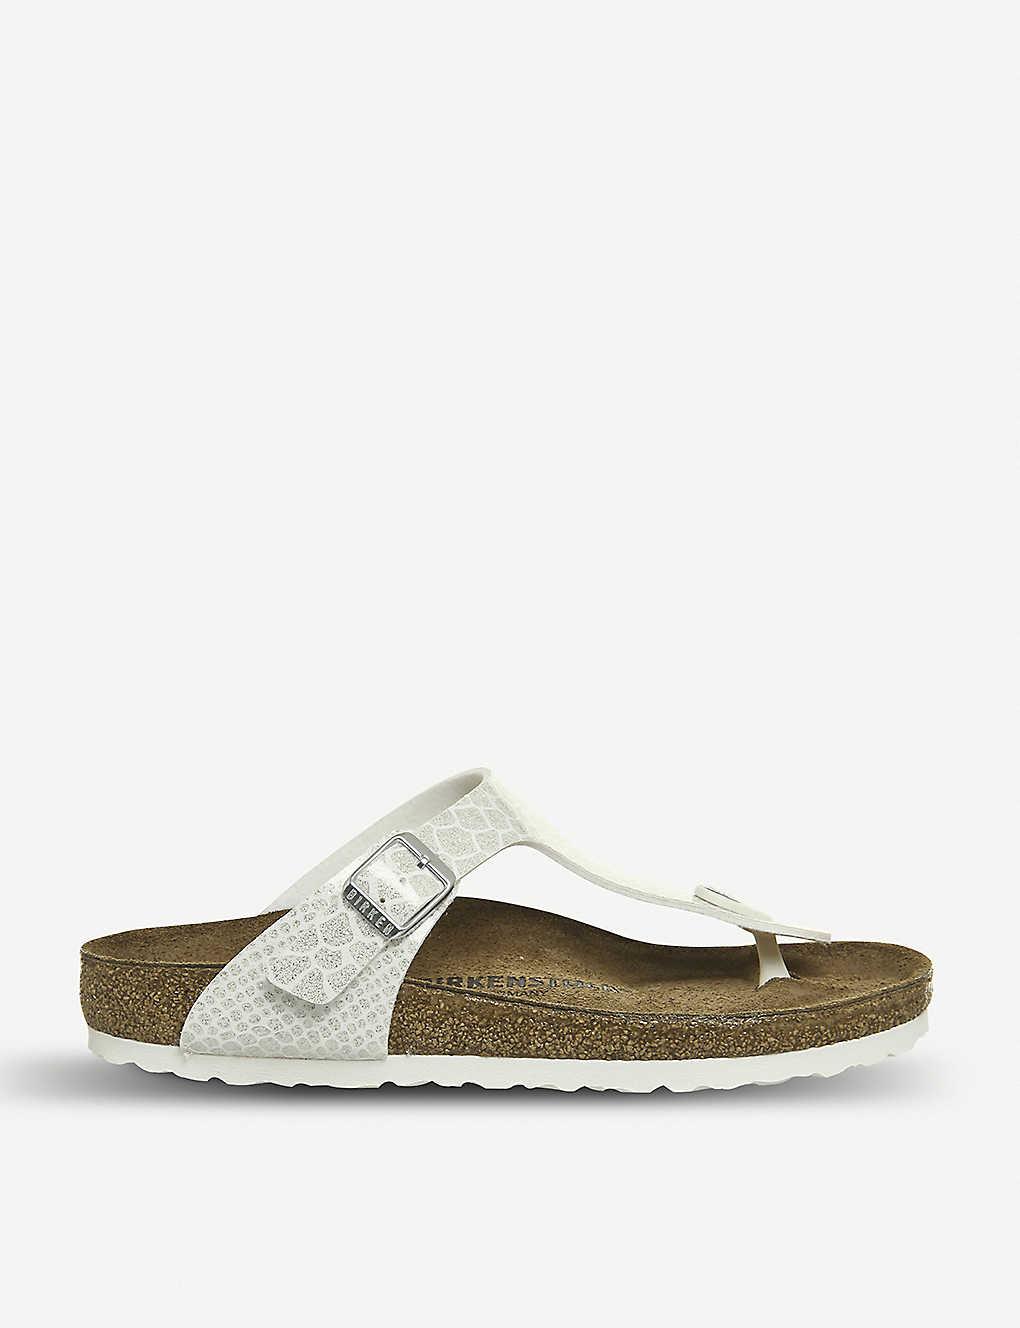 18407767b8e8ae Gizeh birko-flor thong sandals - Magic snake white ...